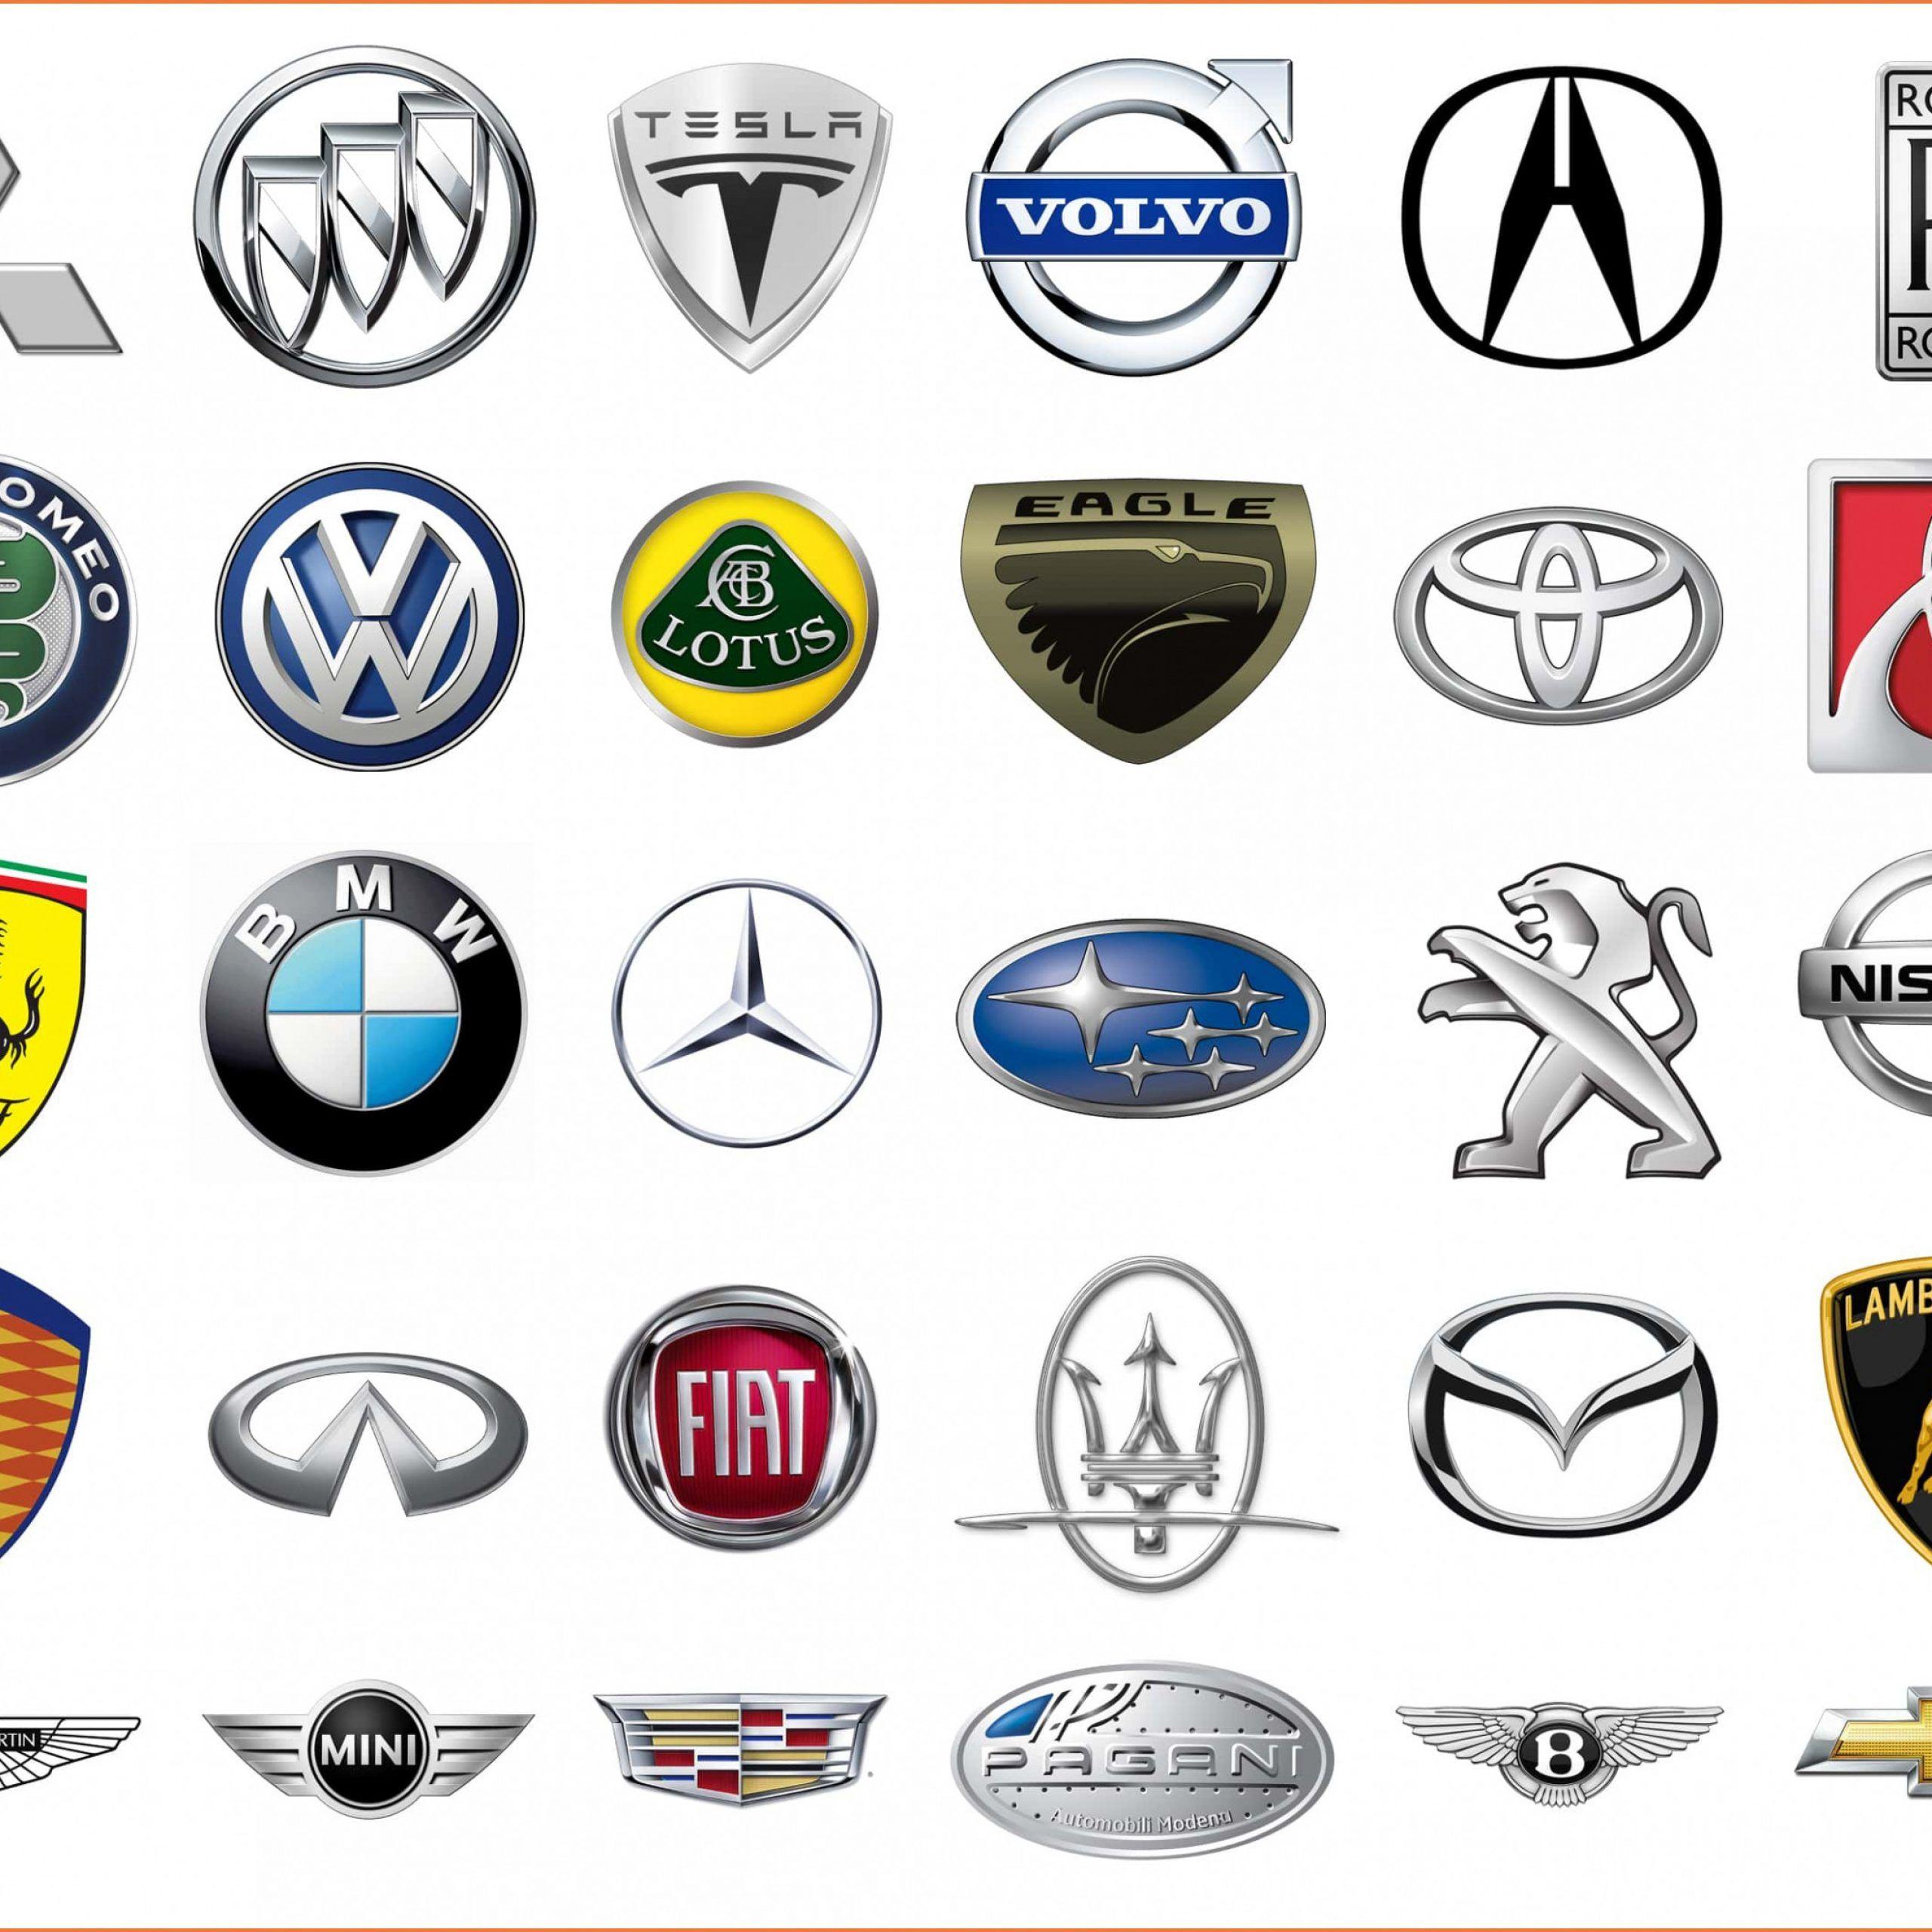 11 Common Myths About Car Brand Logos Car Brand Logos Https Www Carsneat Com 11 Common Myths About Car Brand Logos C In 2020 Car Brands Logos Car Brands Brand Logo